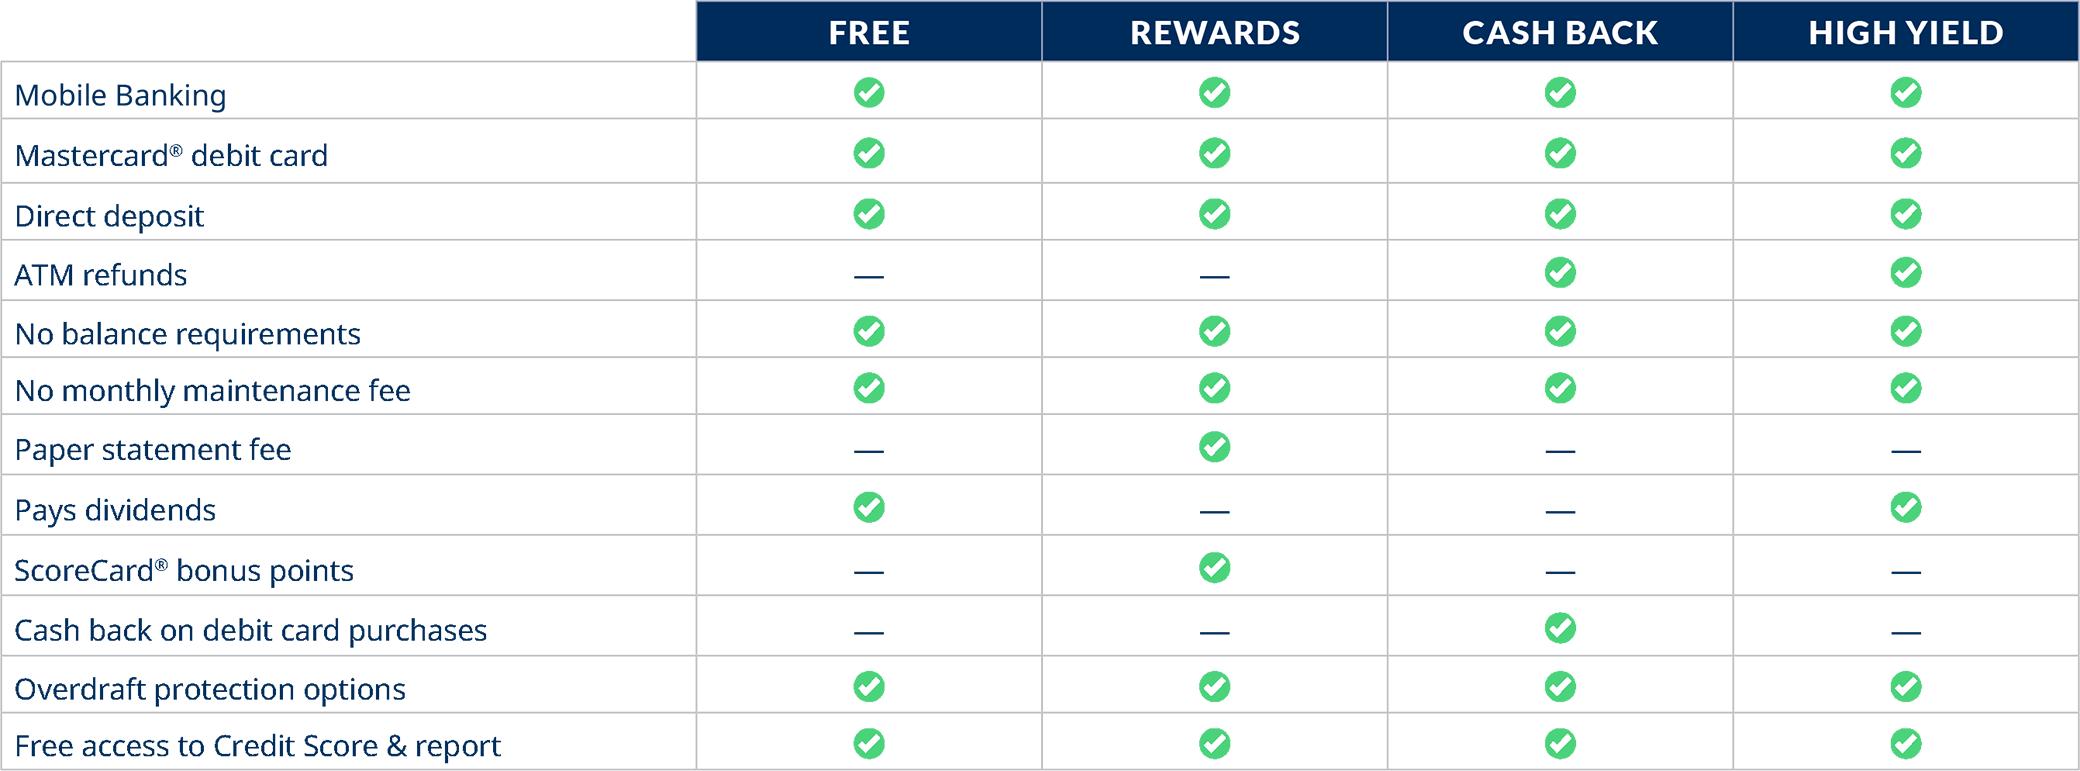 BayPort checking account comparison chart